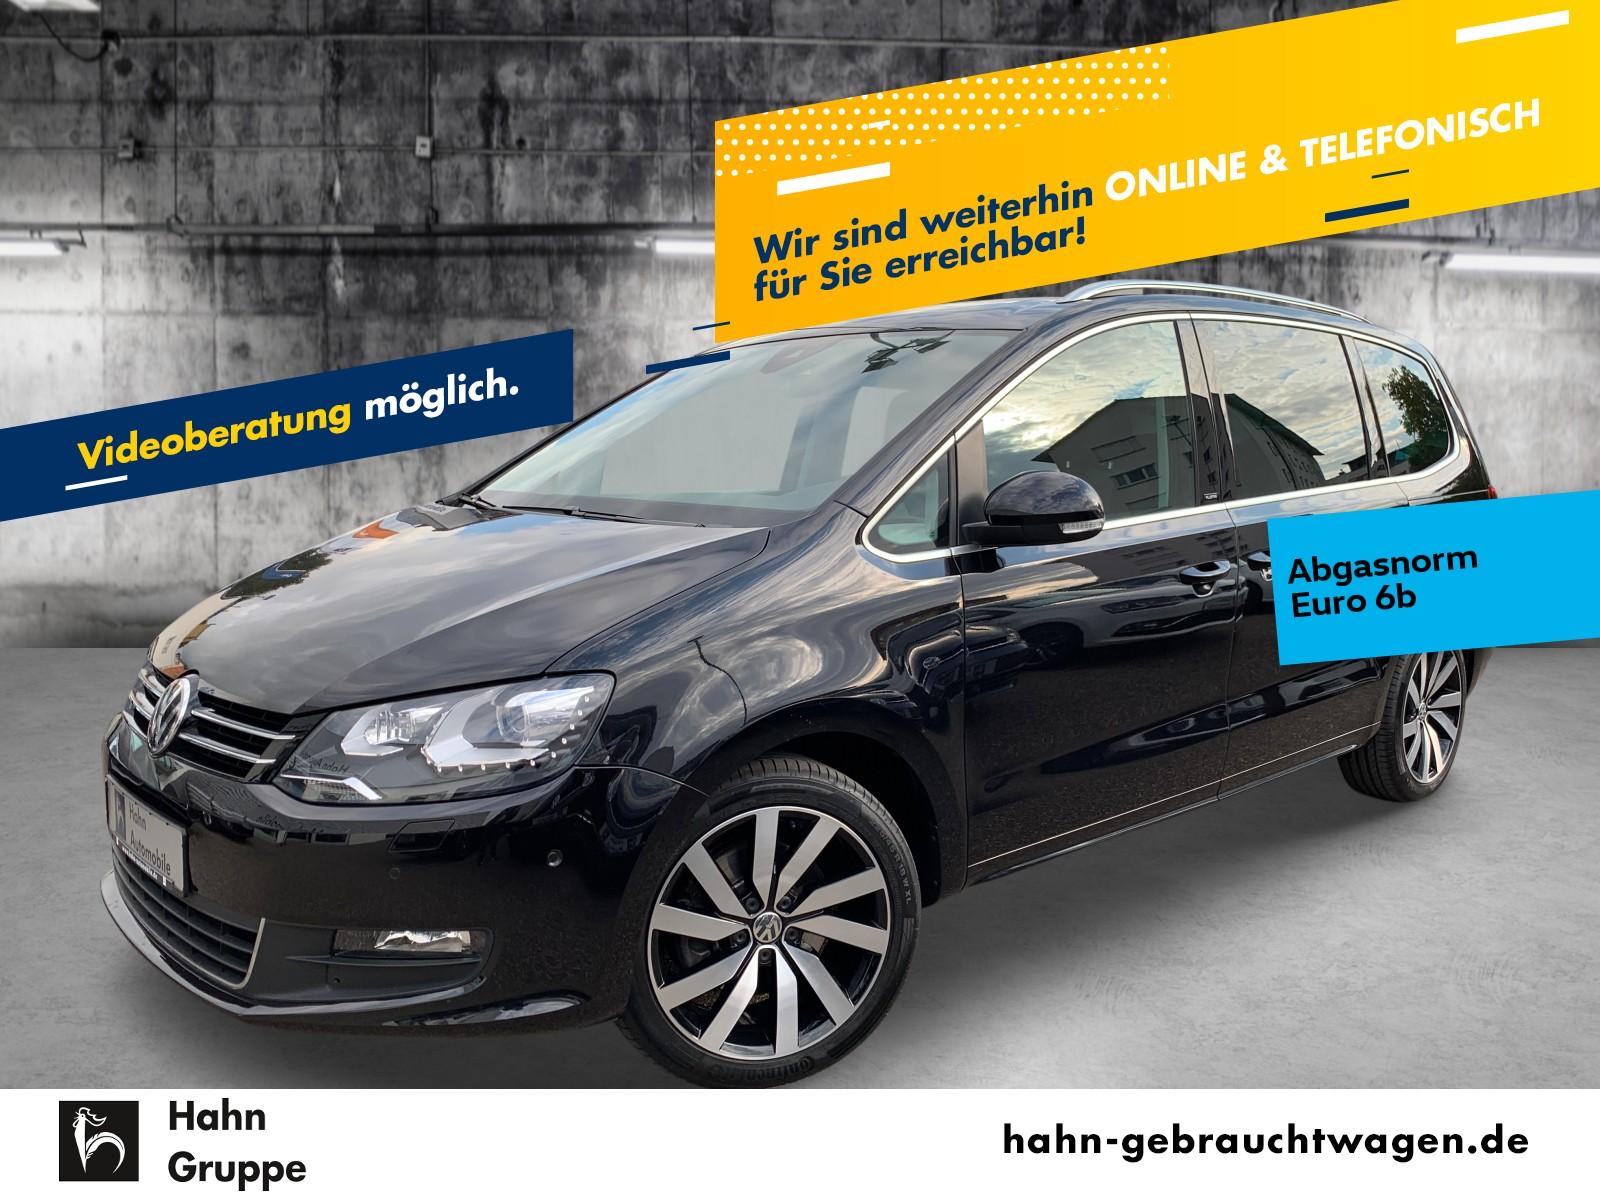 Volkswagen Sharan ALLSTAR 2,0TDI 7-Sitz Nav Pan Xen ACC AHK, Jahr 2016, Diesel